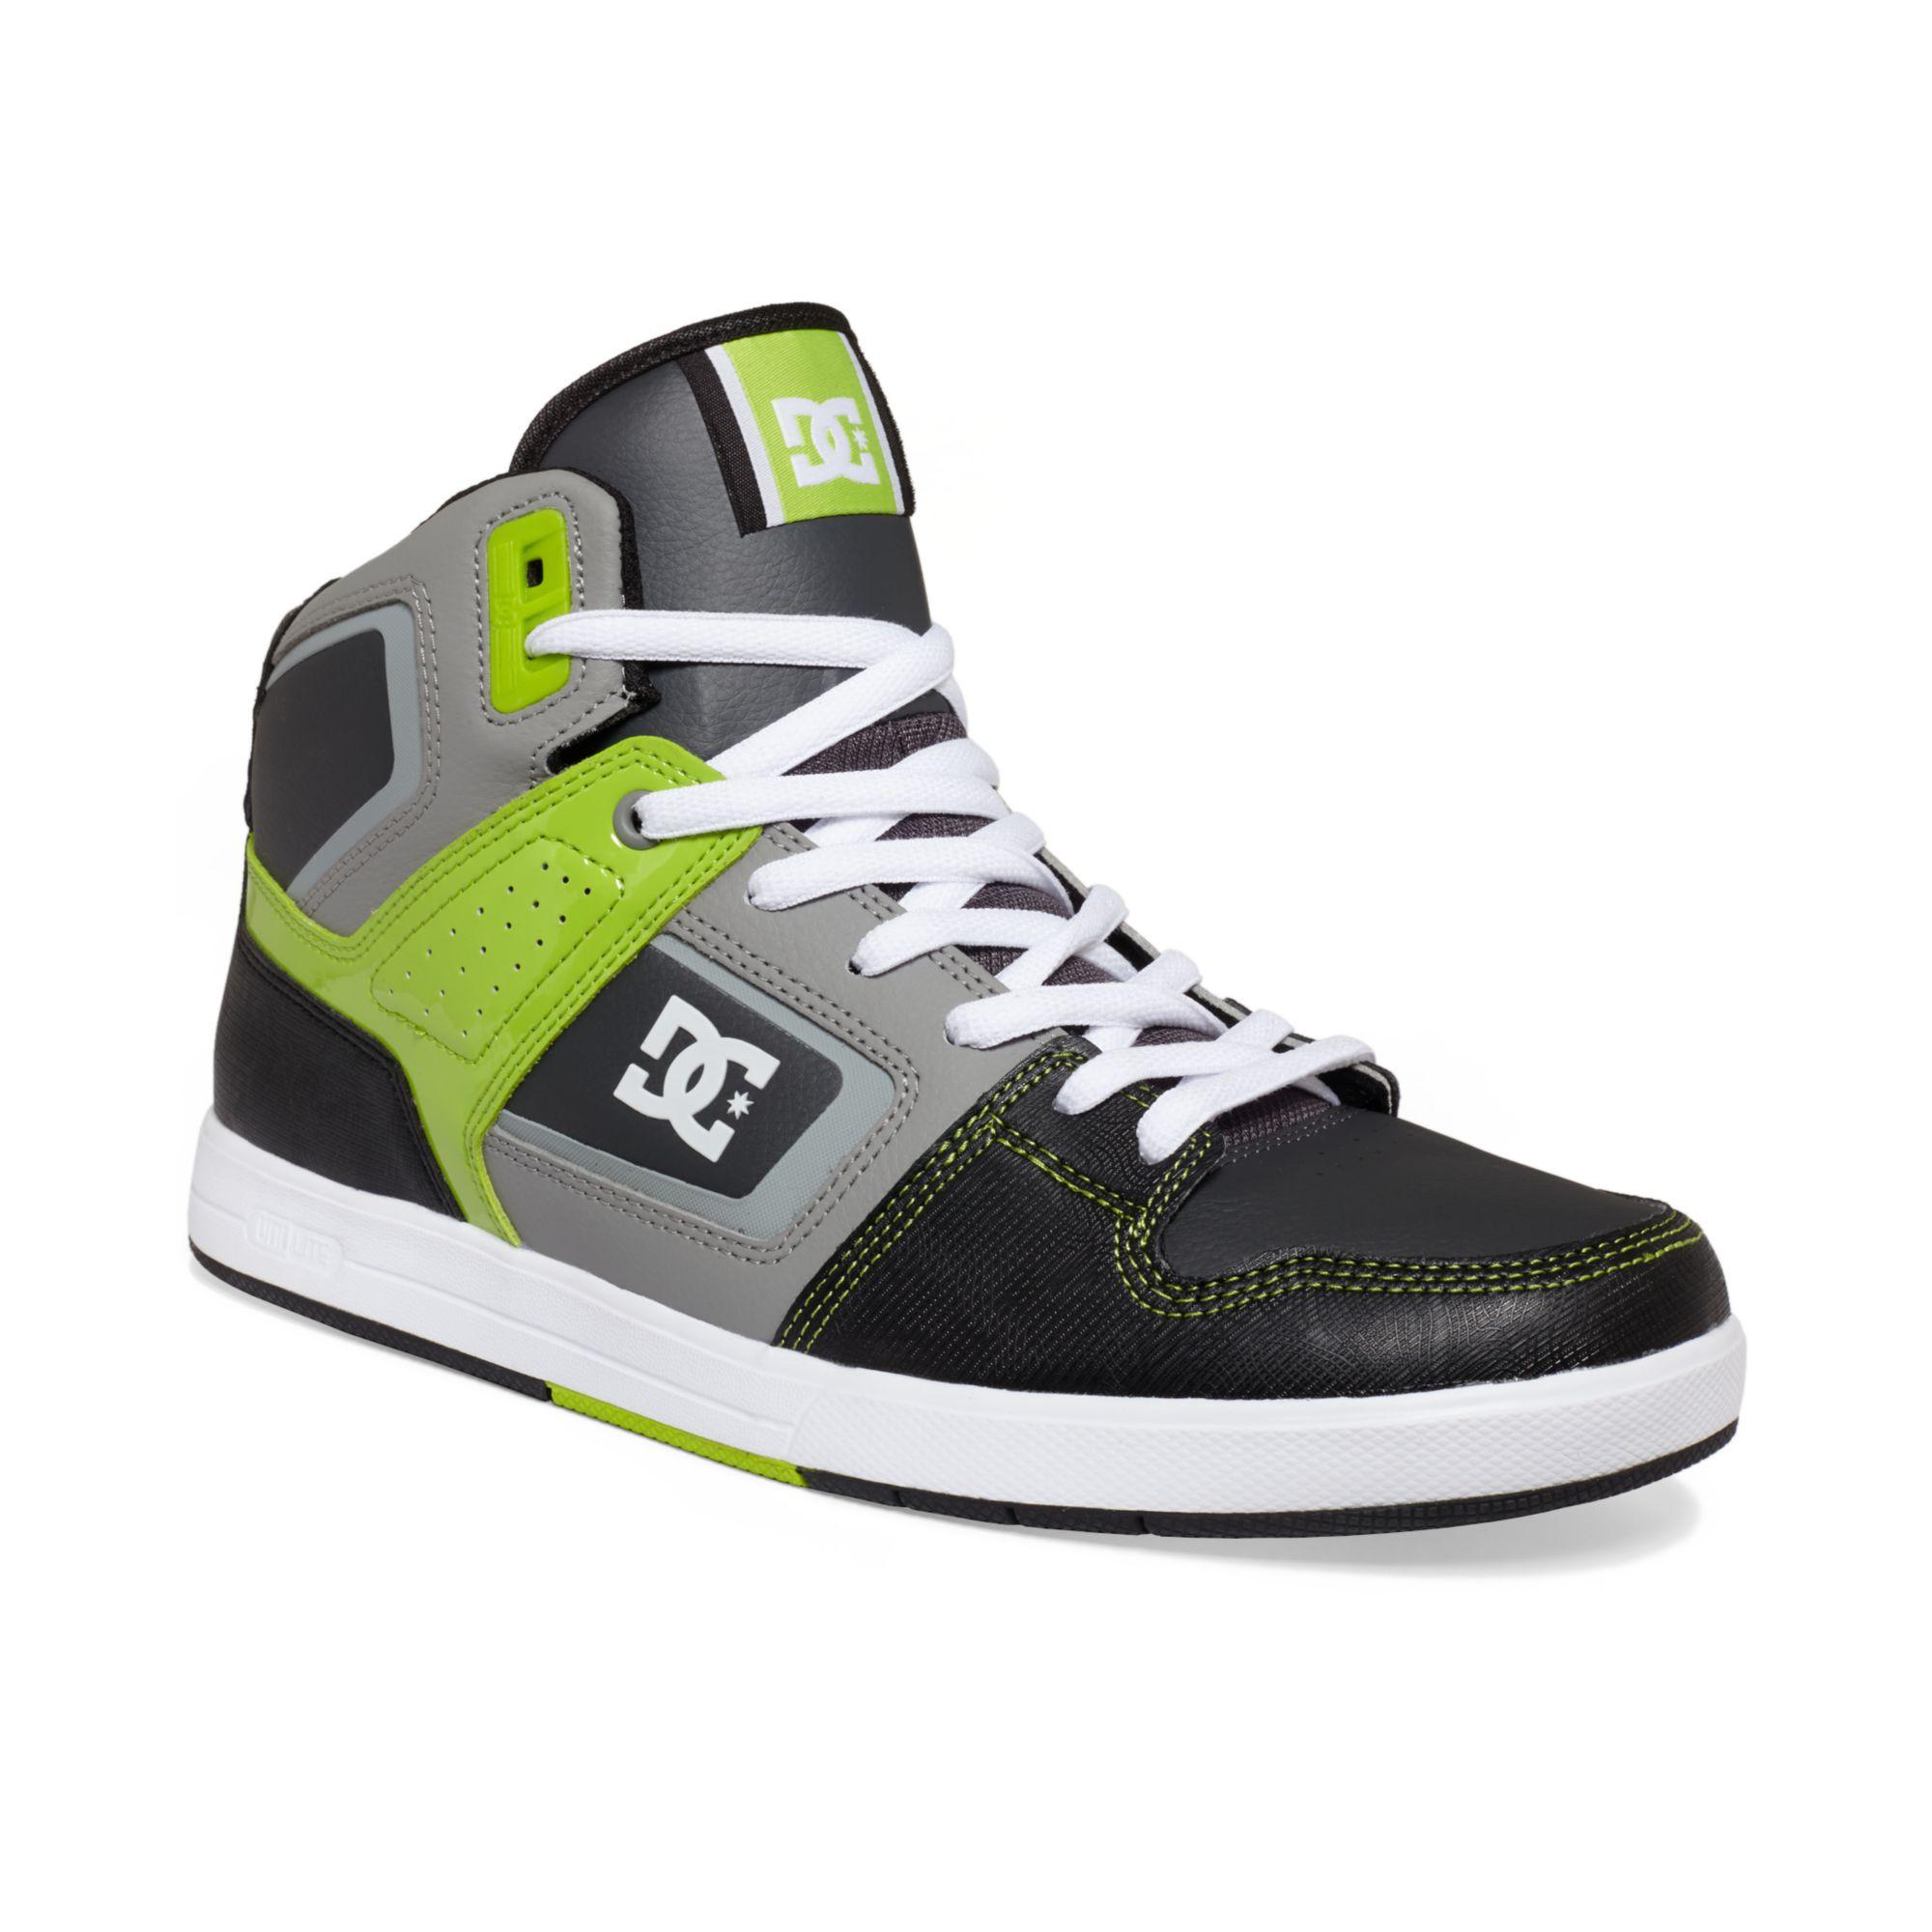 DC Shoes Factory Lite Hi Sneakers in